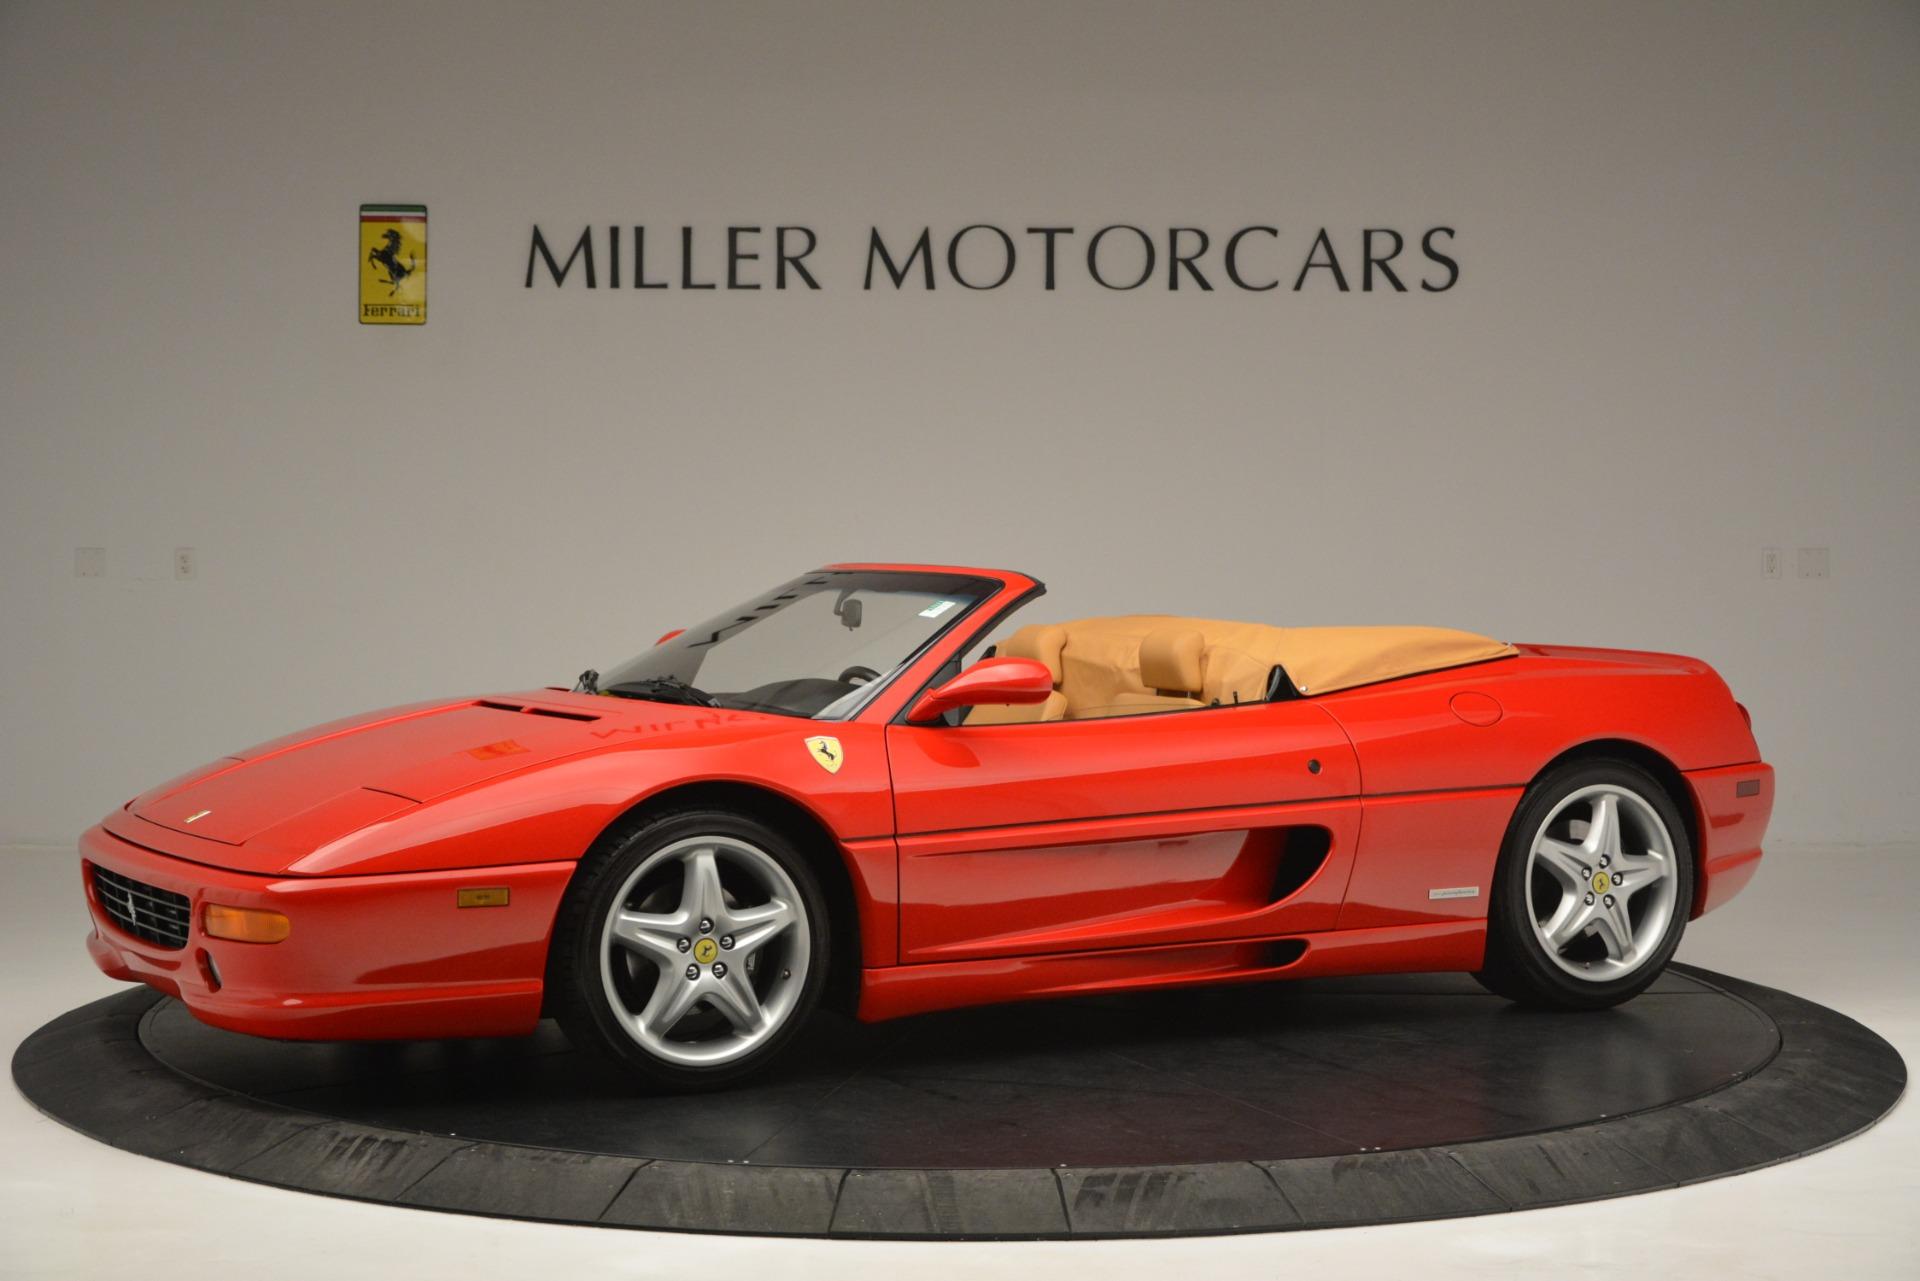 Used 1997 Ferrari 355 Spider 6-Speed Manual For Sale In Westport, CT 2735_p2